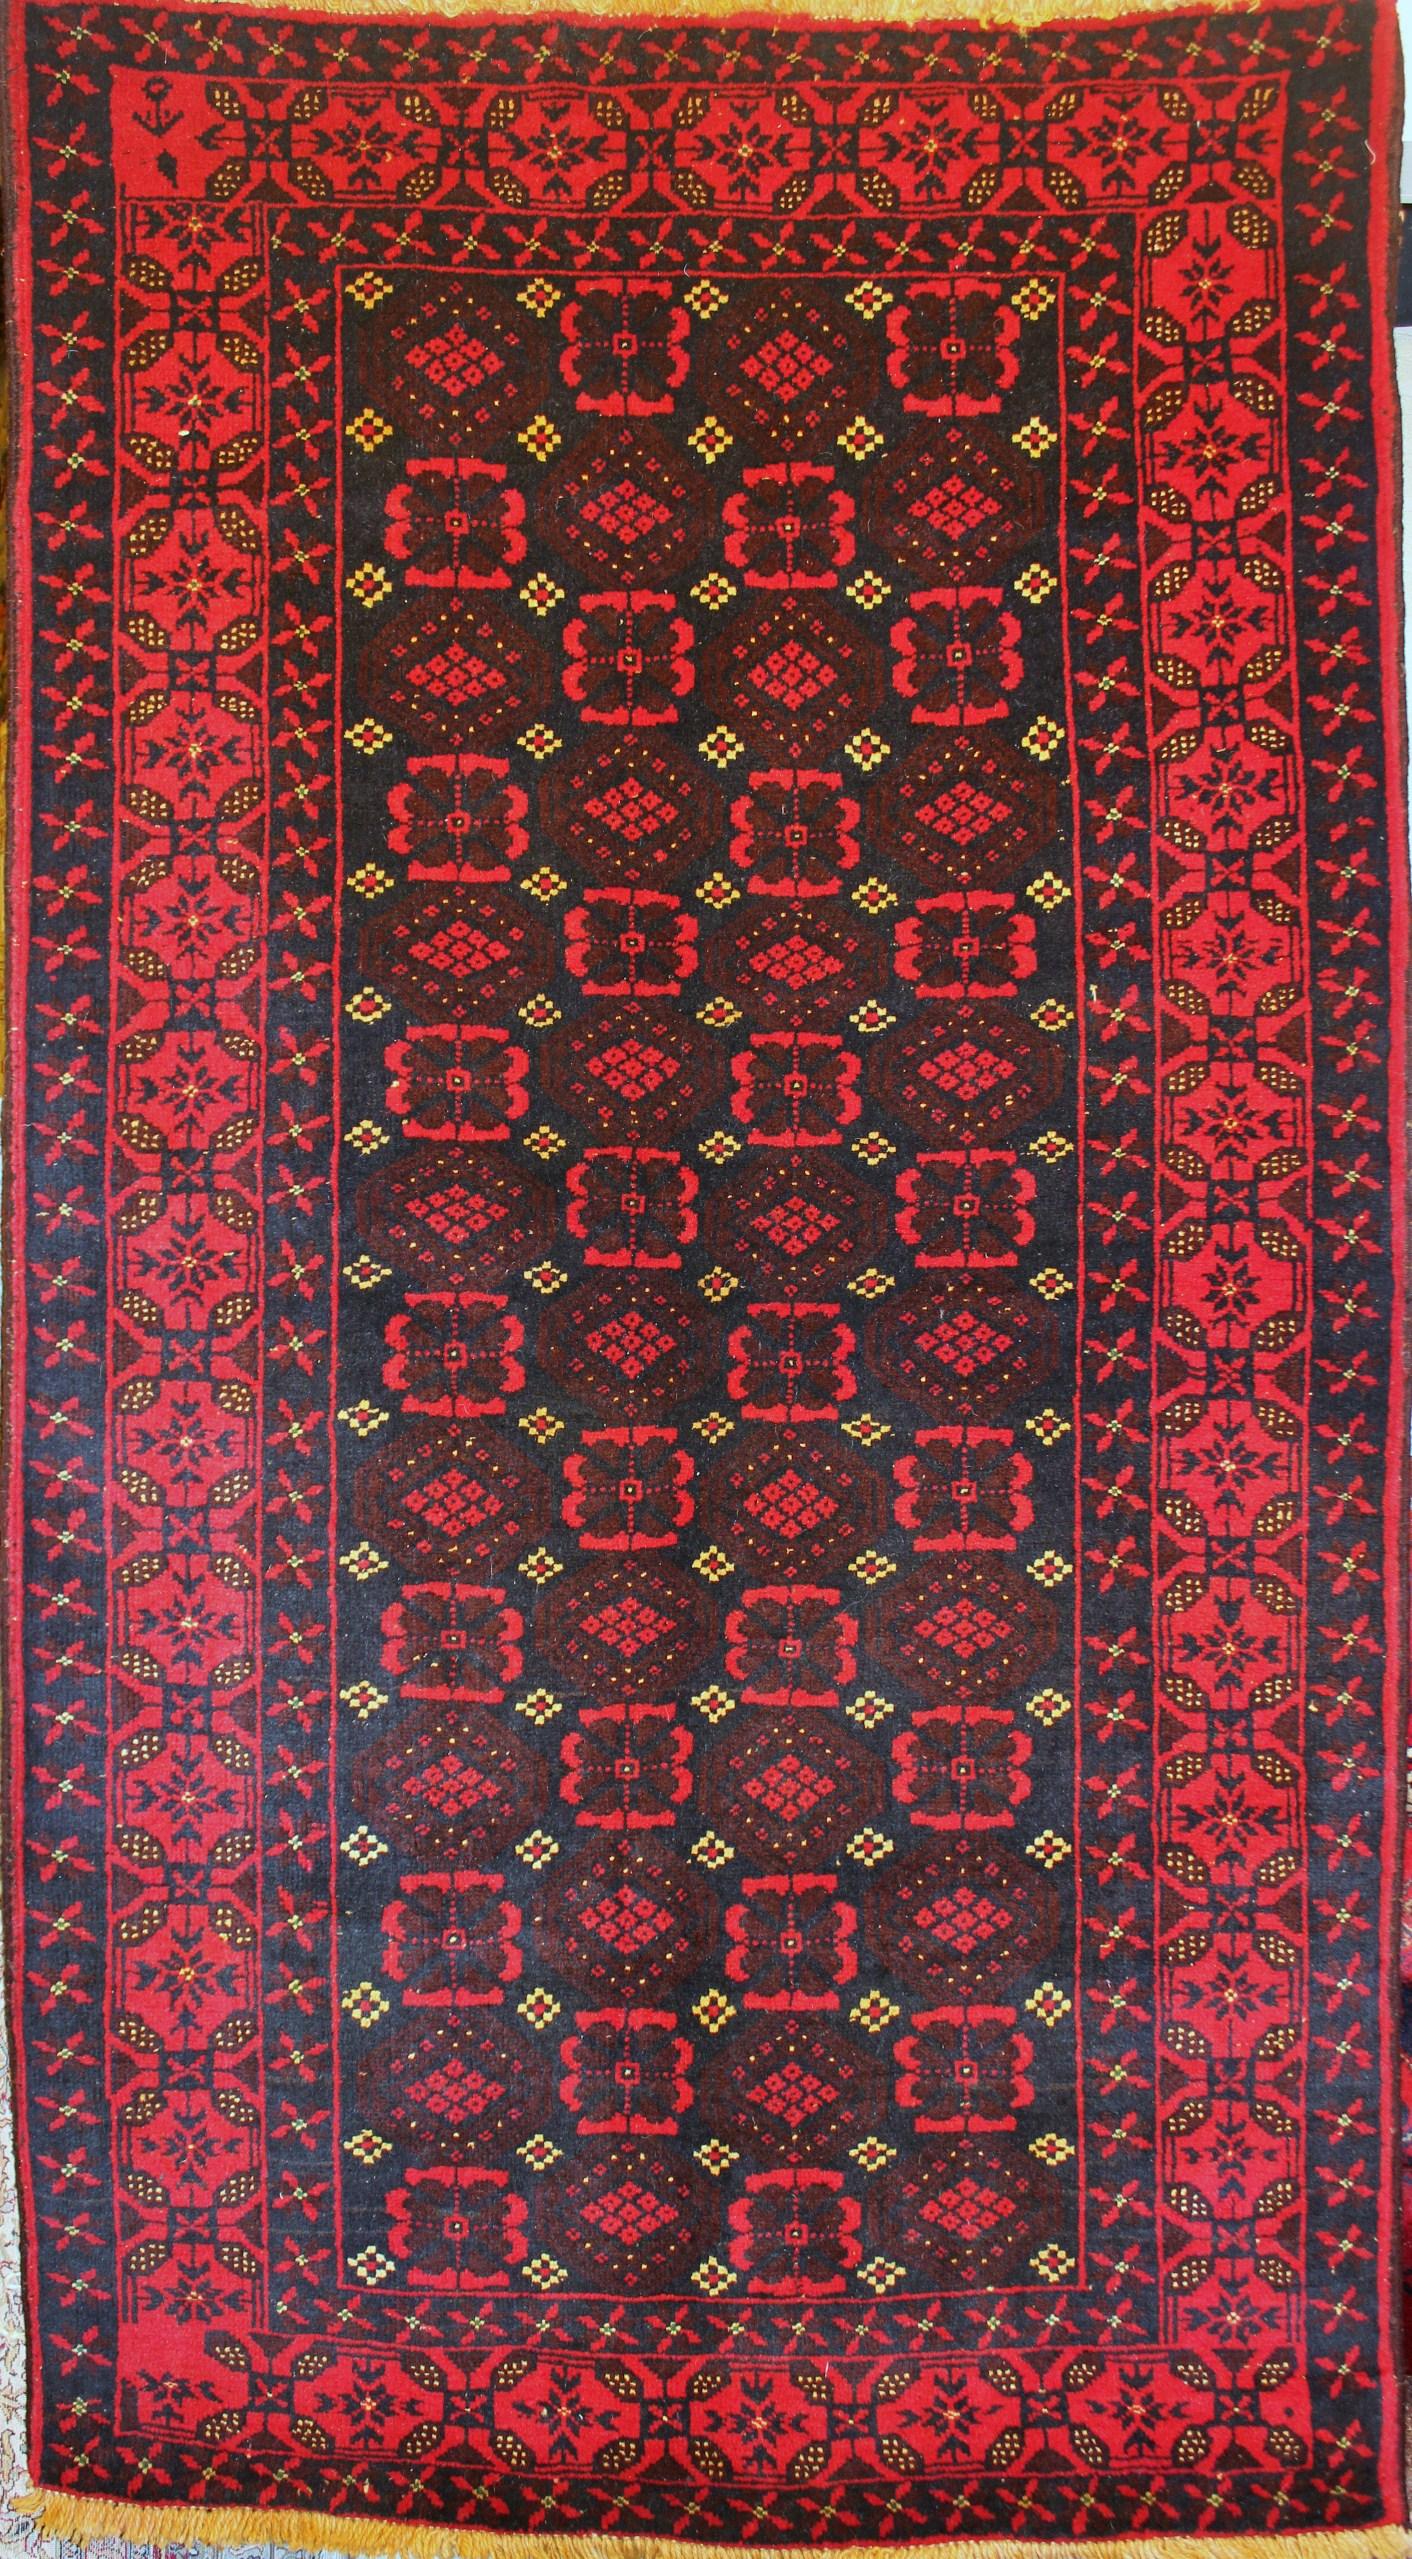 tapis persan beloutch 175x100 gobelins tapis. Black Bedroom Furniture Sets. Home Design Ideas